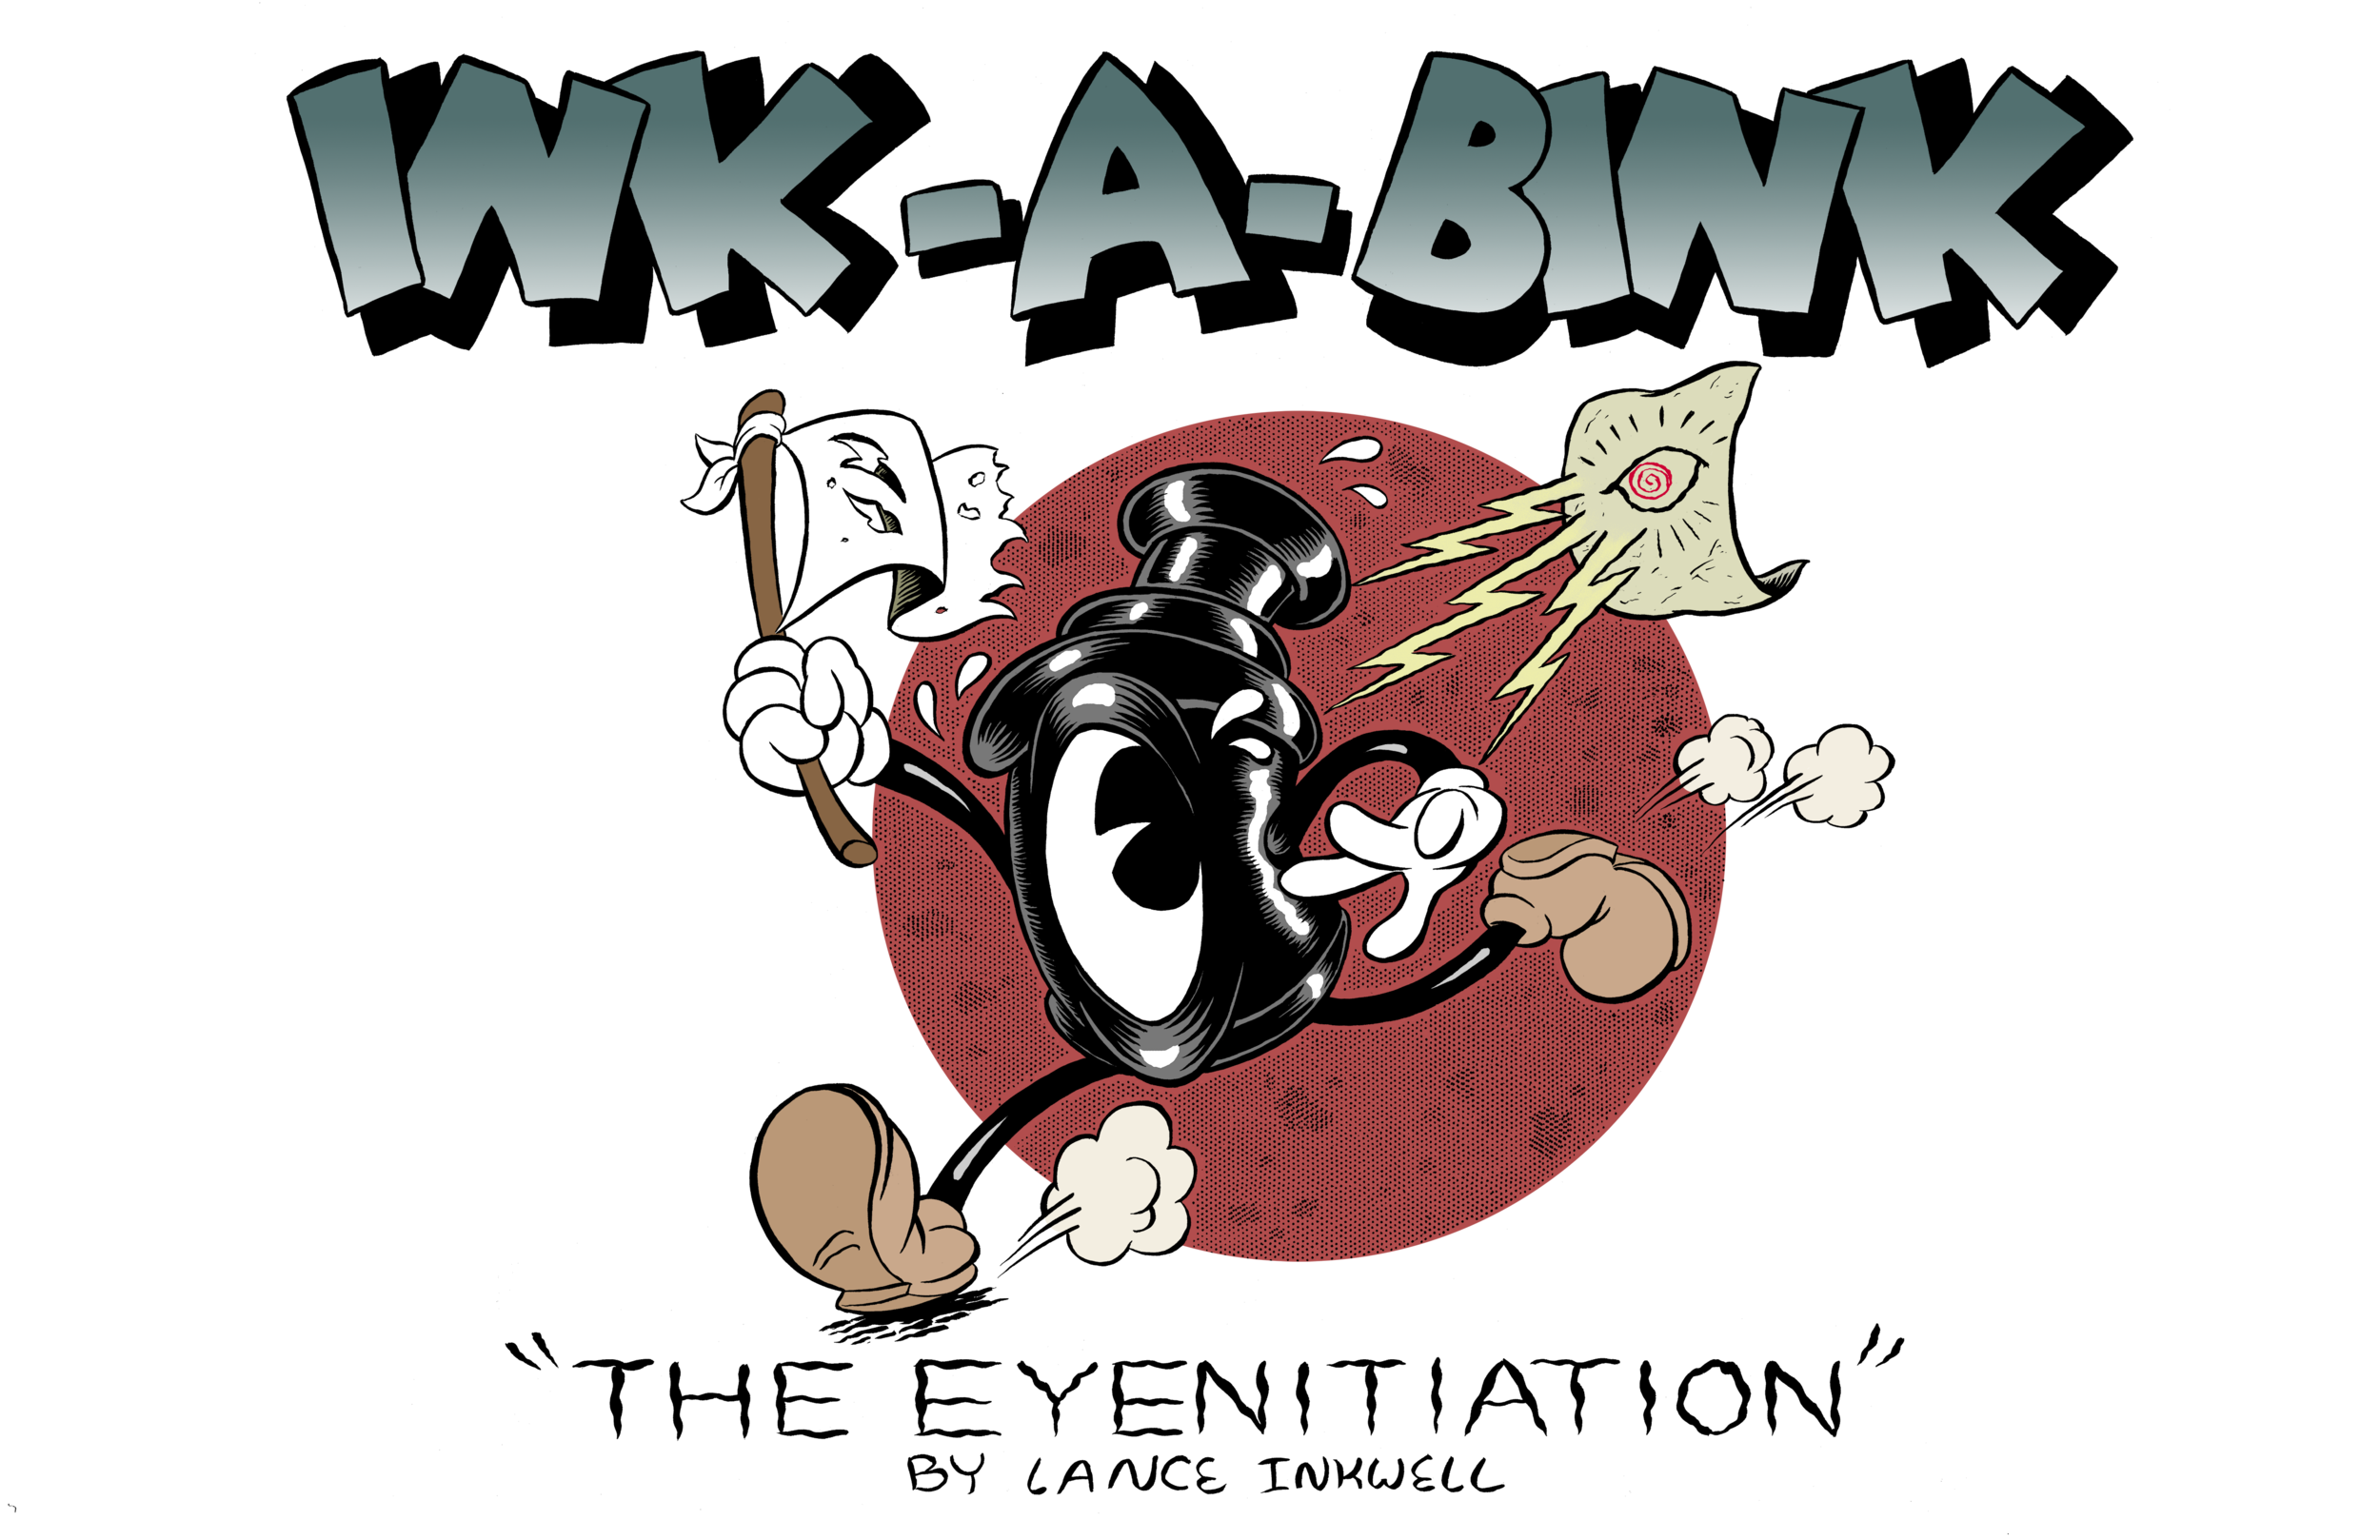 InkABinktheeyenitiationcover-300dpihue20141215_16150554.png